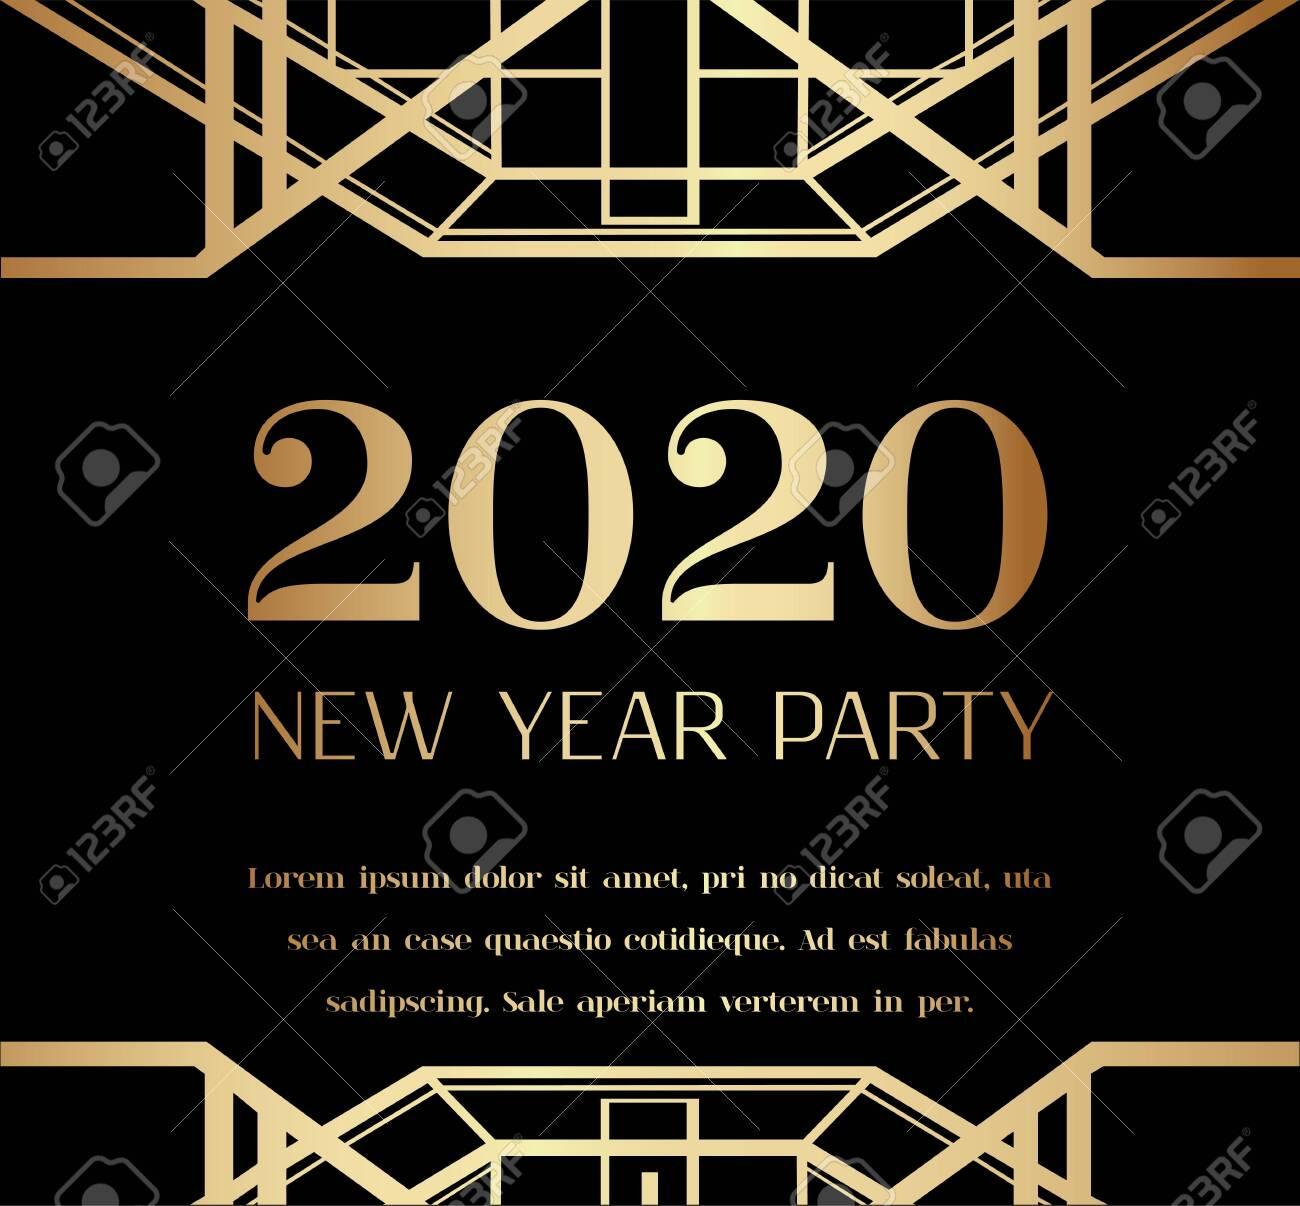 2020 New Year Party Art Deco Invitation Design - 146601574